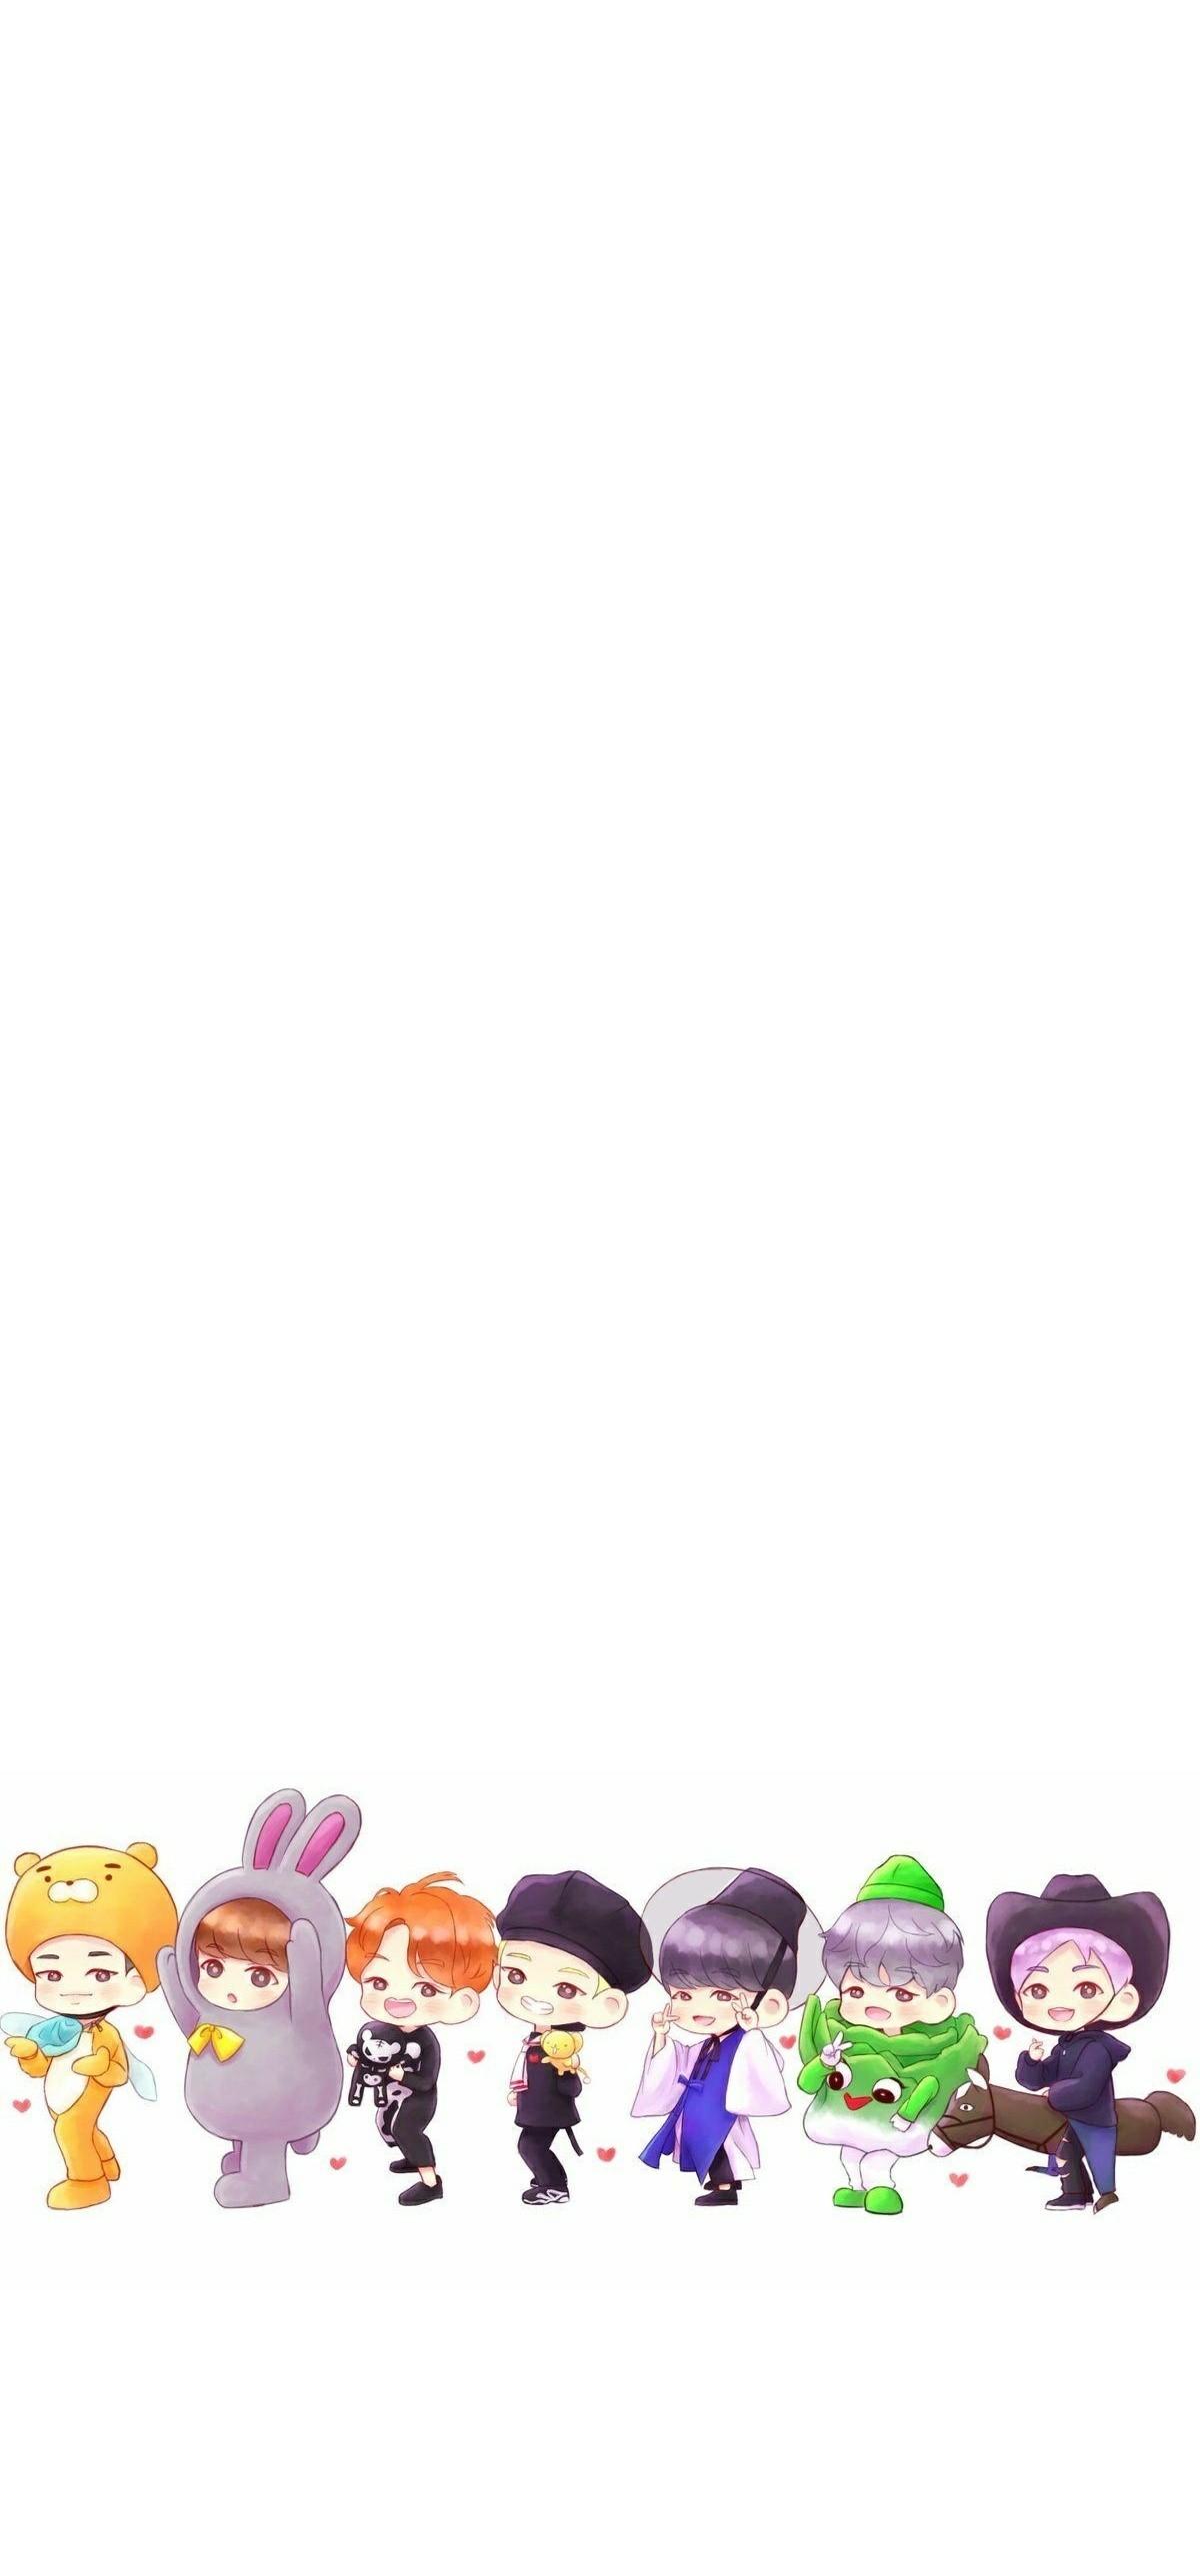 Free wallpaper bts anime wallpaper hd - Chibi background ...